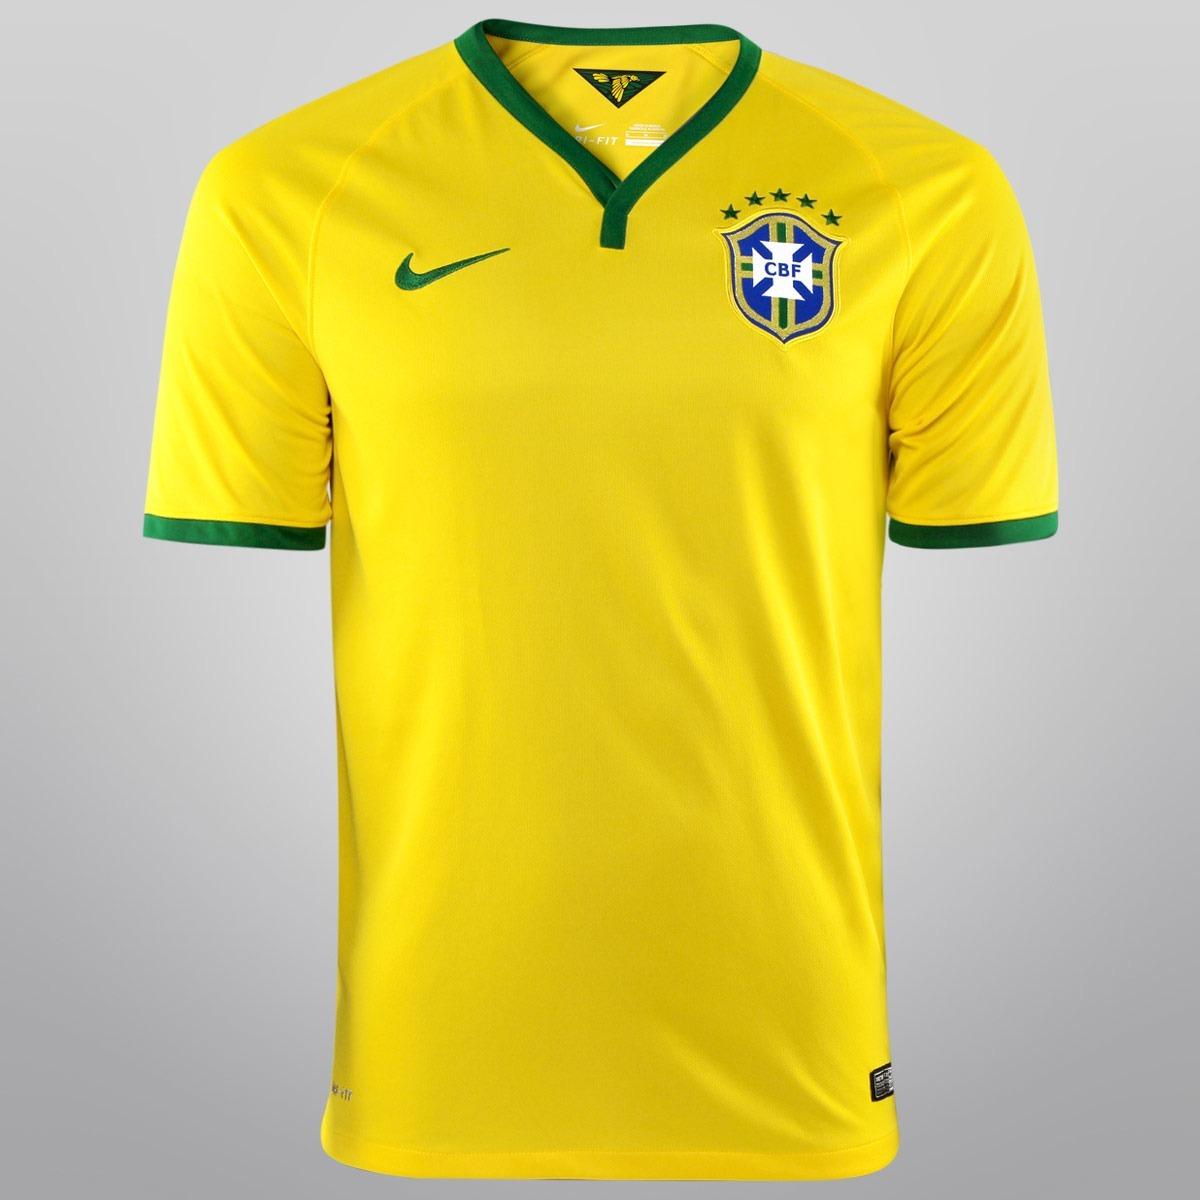 c4b879c0850a5 Camisa Brasil Cbf - Nike